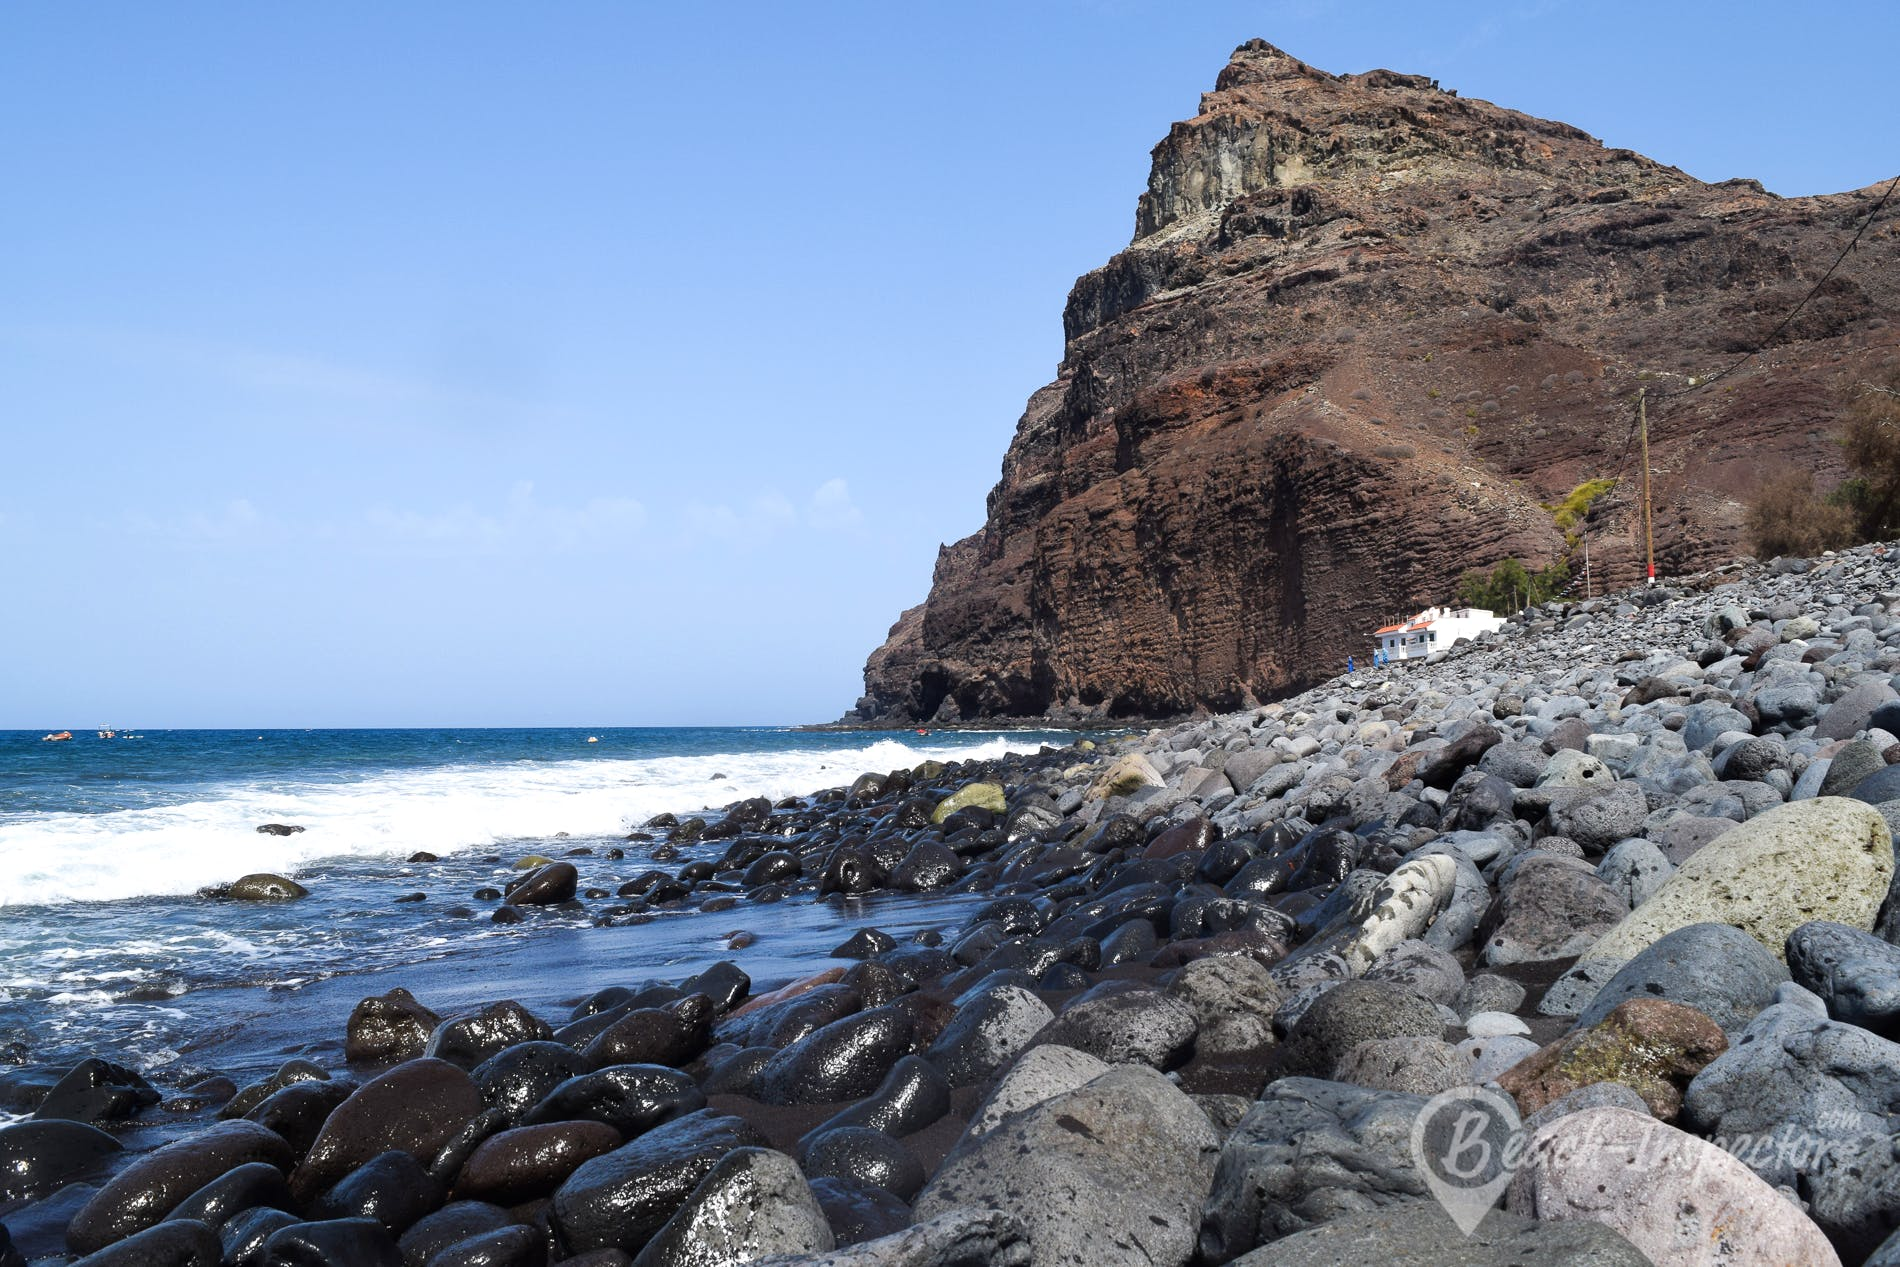 Beach Playa de Tasarte, Gran Canaria, Spain